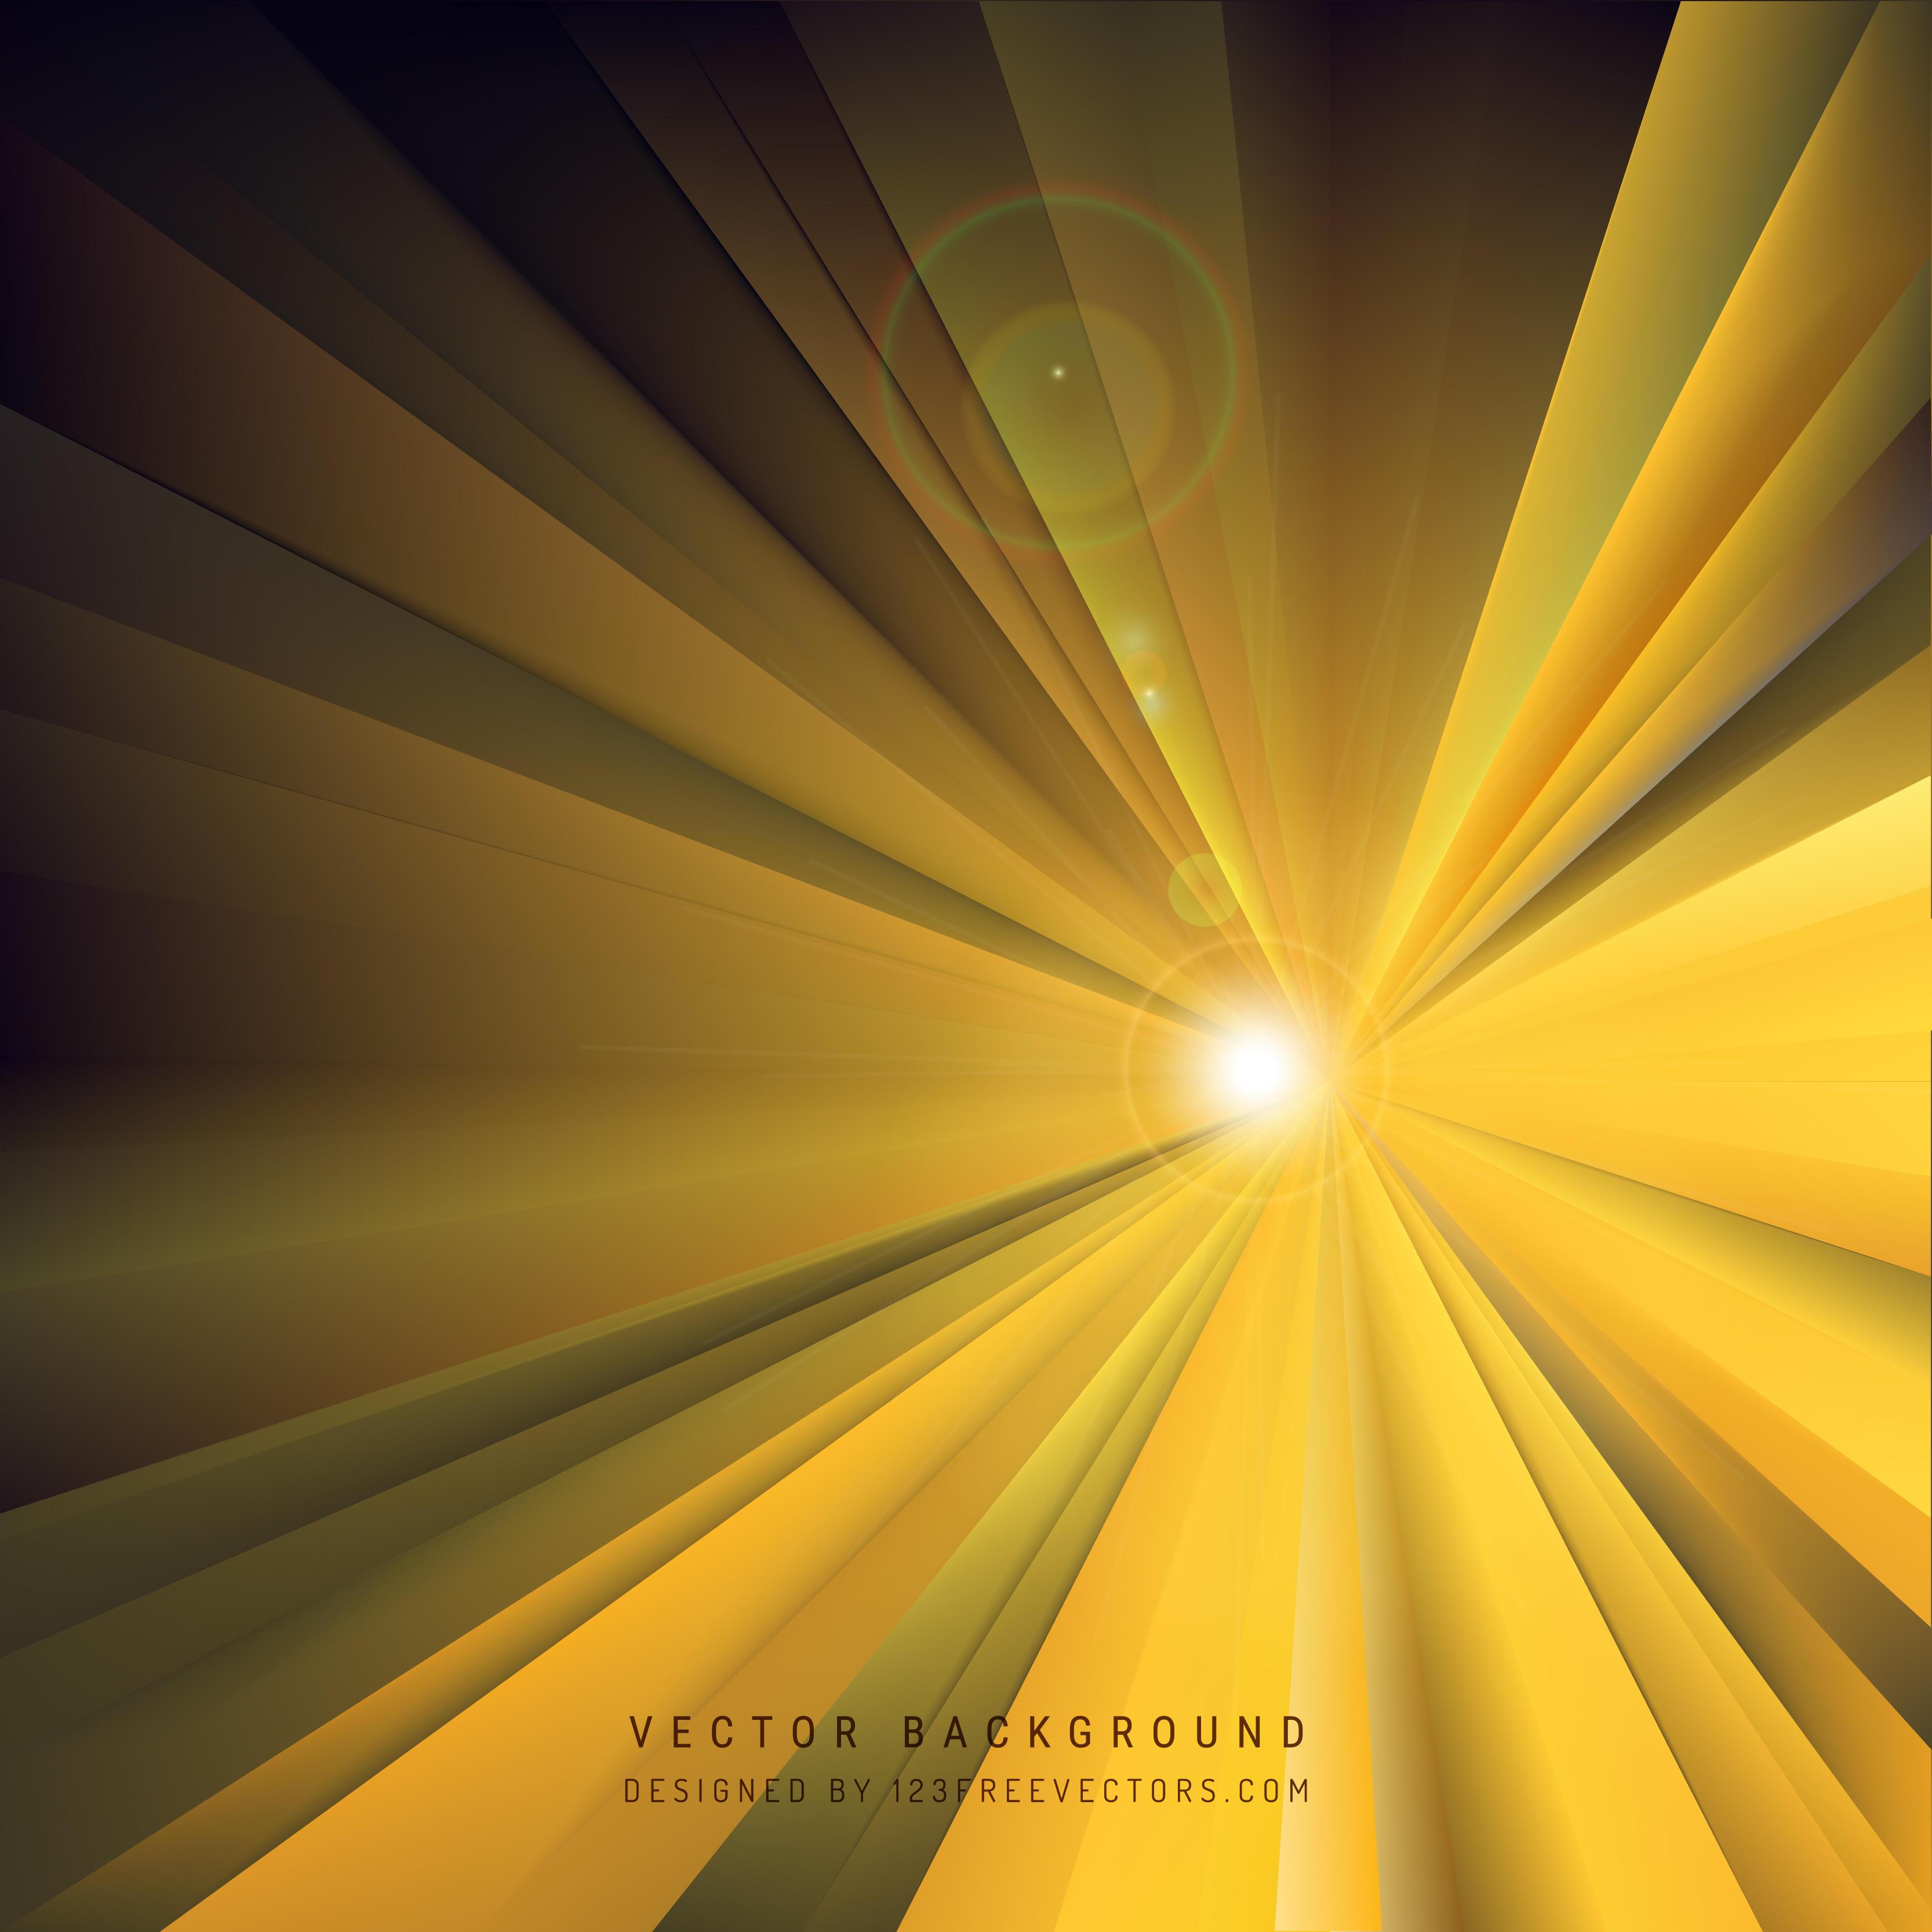 Black Yellow Light Rays Background Template | 123Freevectors for Yellow Light Rays Background  75sfw